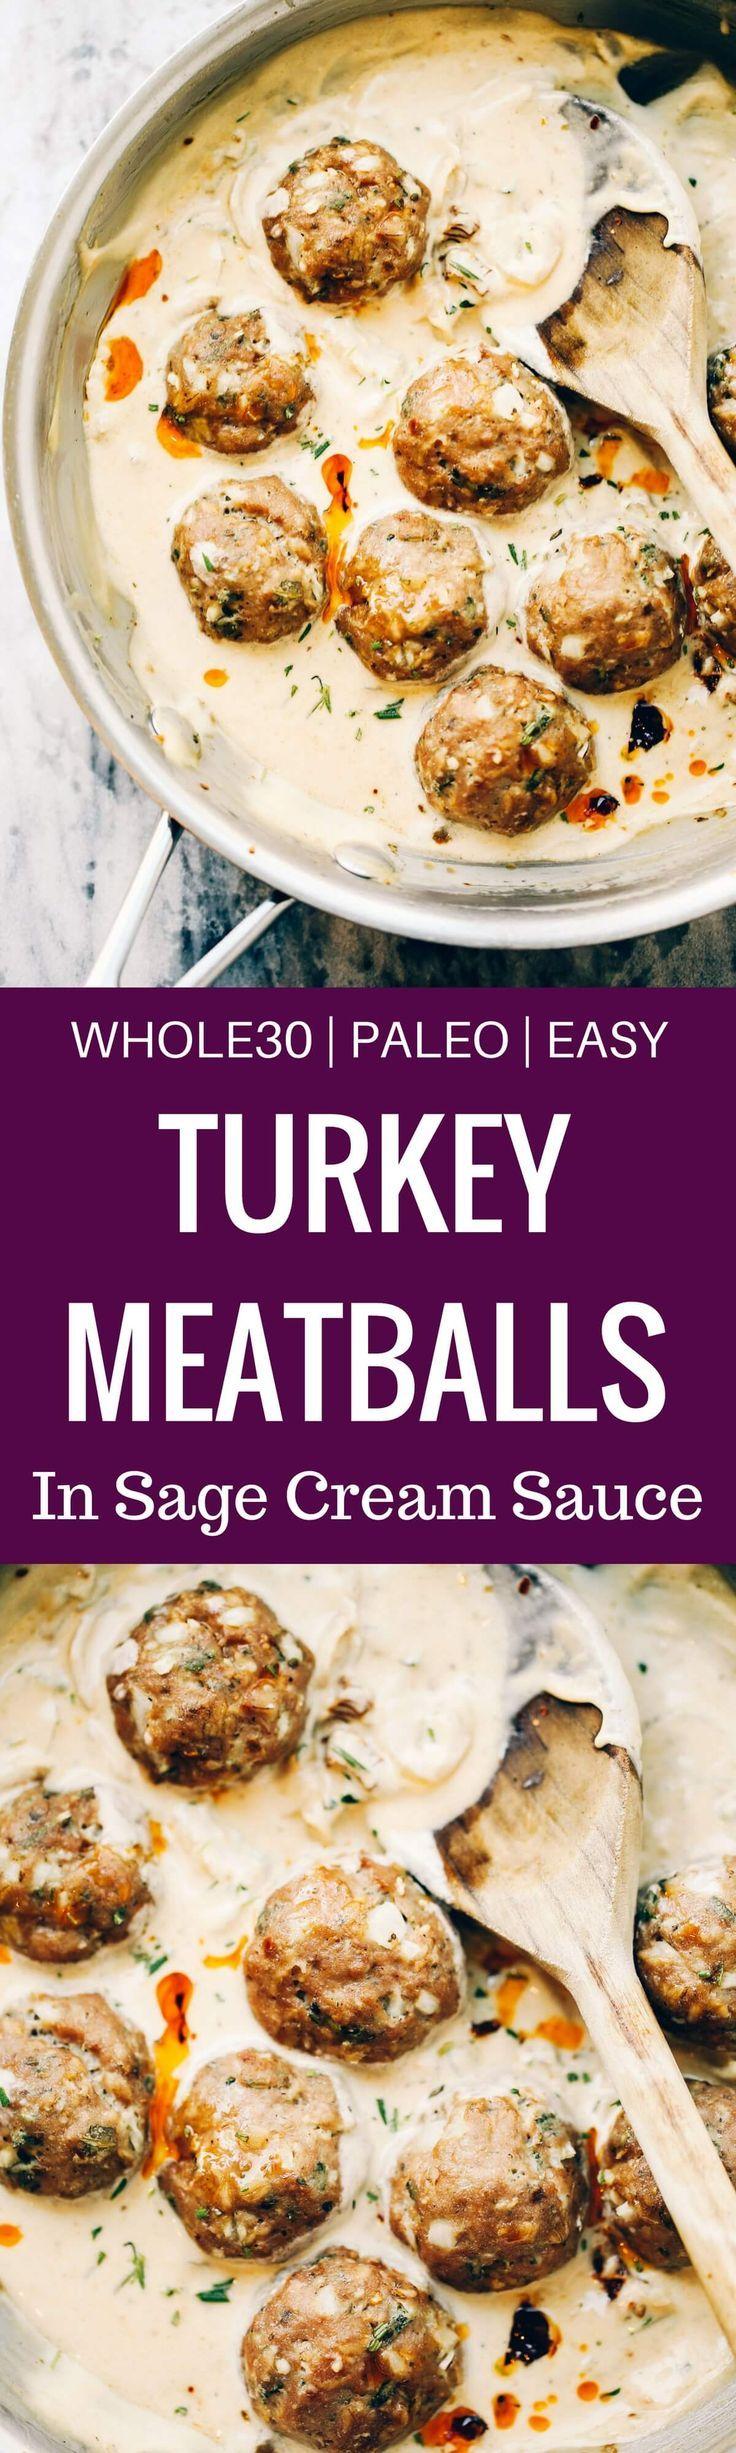 turkey sausage meatballs in sage cream sauce paleo gluten free eats recipe easy whole 30 recipes whole 30 breakfast whole30 breakfast recipes turkey sausage meatballs in sage cream sauce